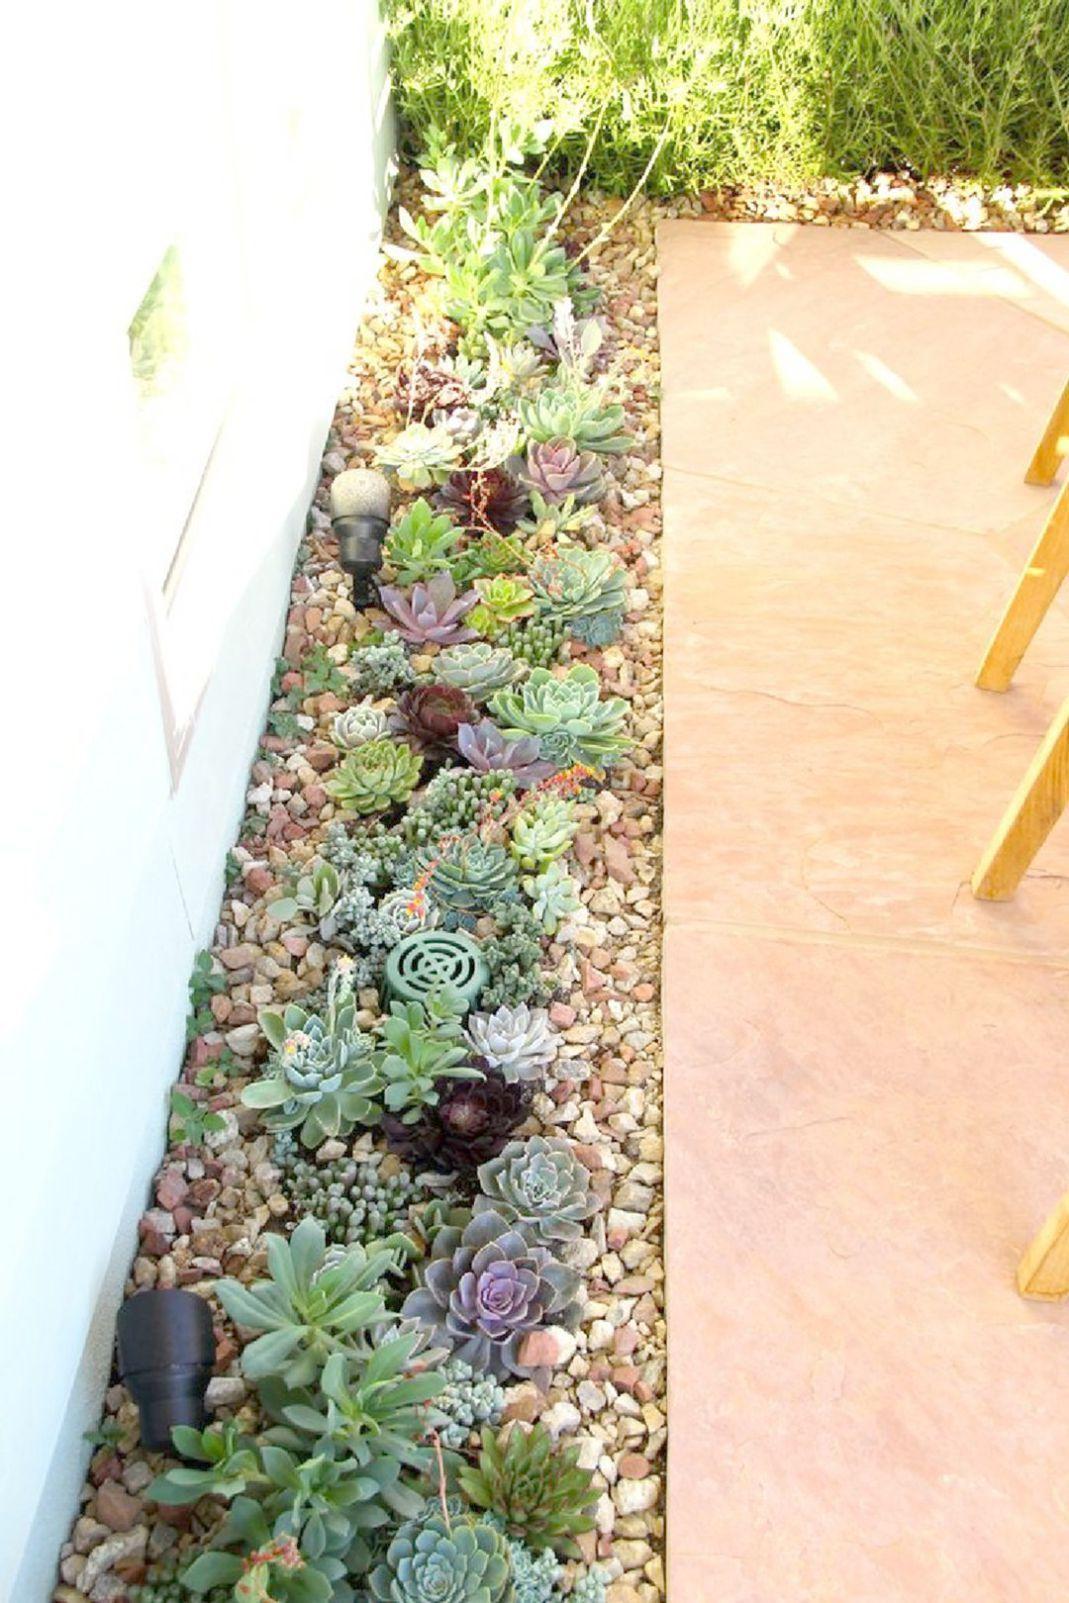 d5a8029dd15bab281a78ffc2077a0772 - Hard Landscaping Ideas For Small Gardens